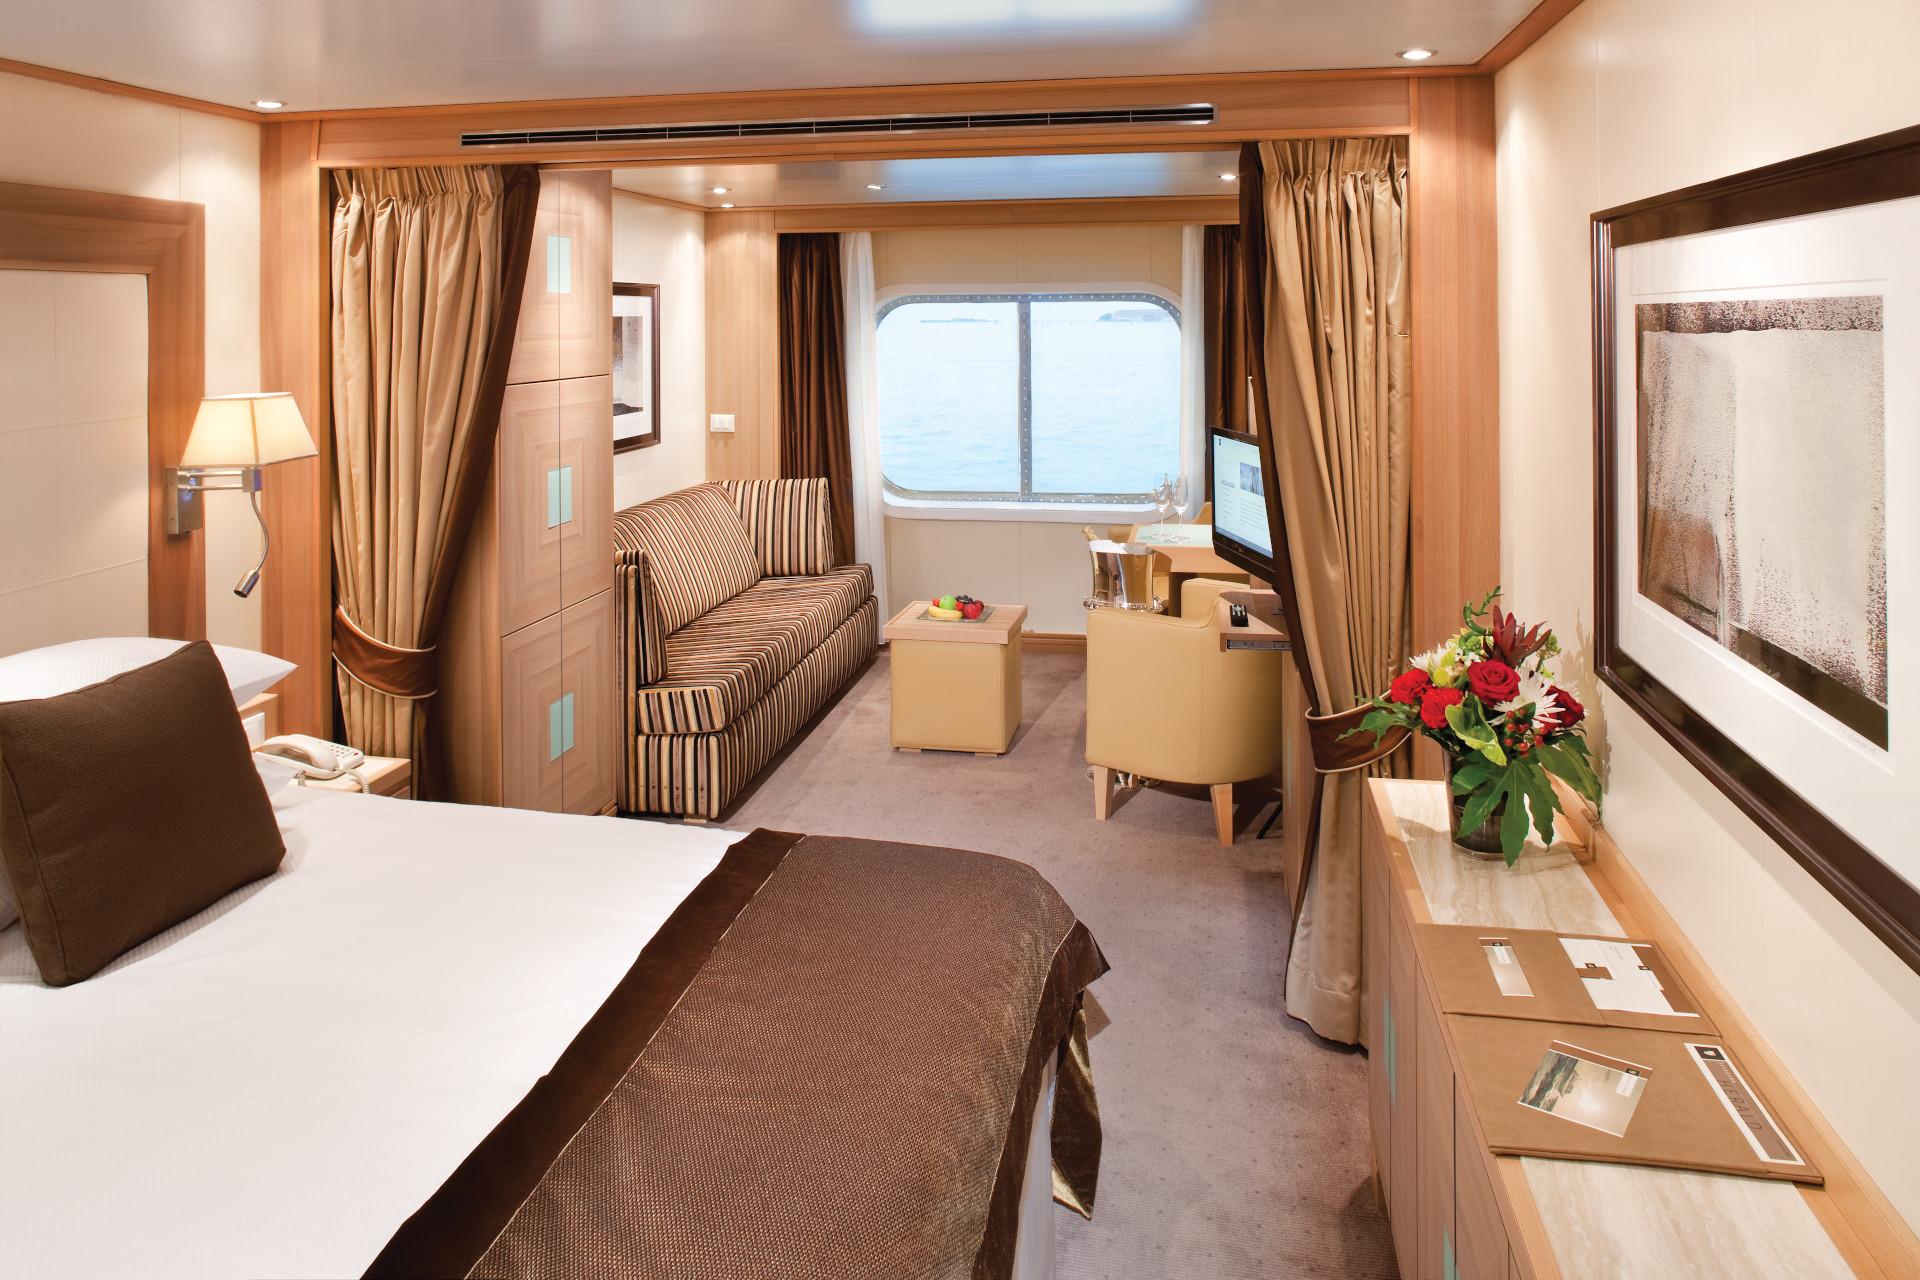 Ocean View Suite A / A1 - Seabourn Quest - Bild 1 - Thumb